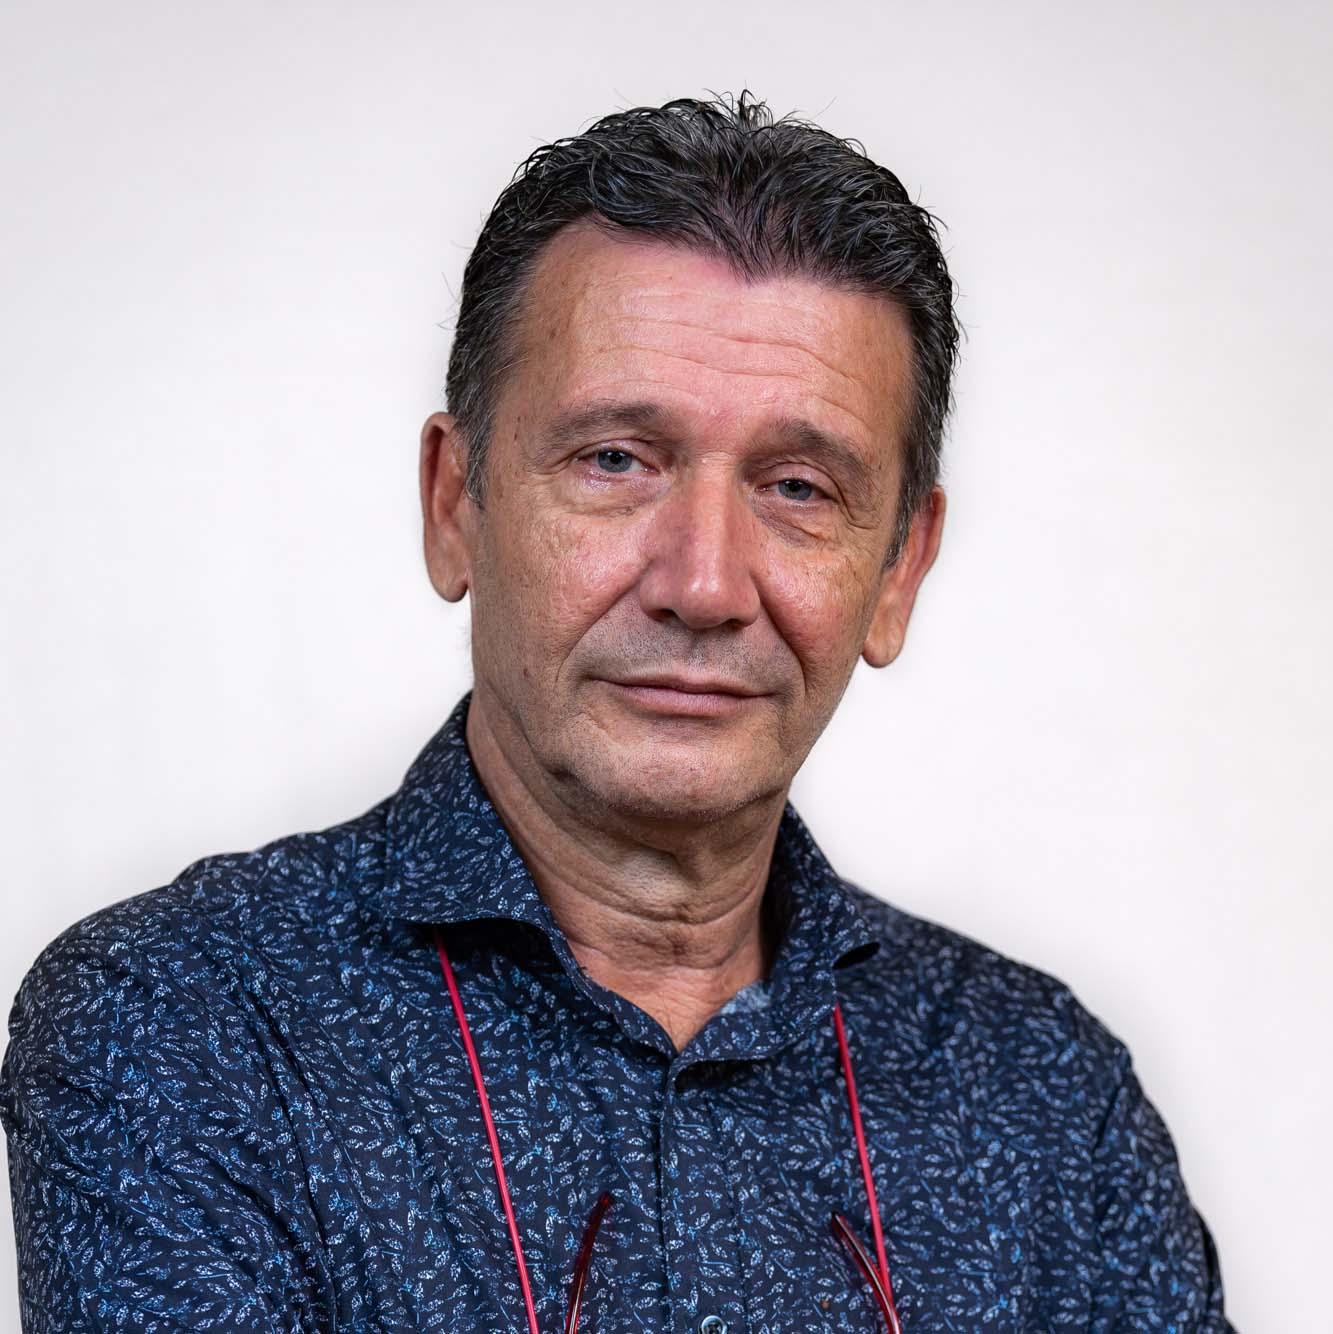 Dott. Carmelo Panebianco